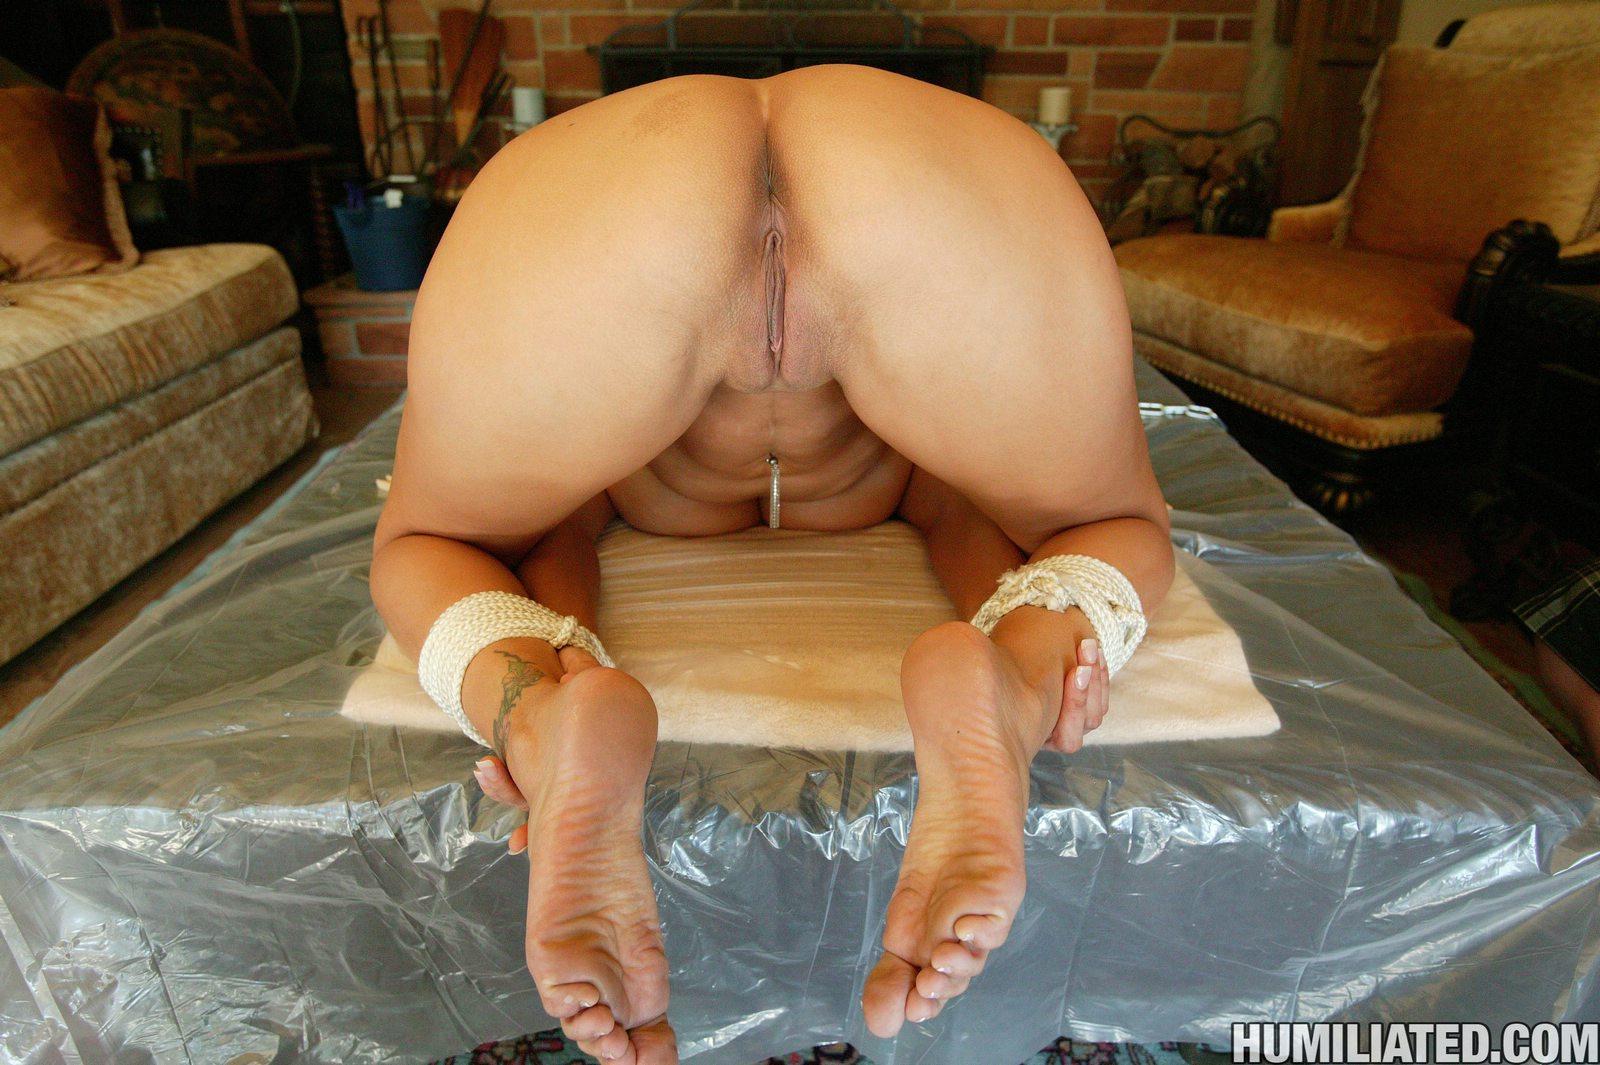 sophia lomeli getting bondaged humiliated and fucked my